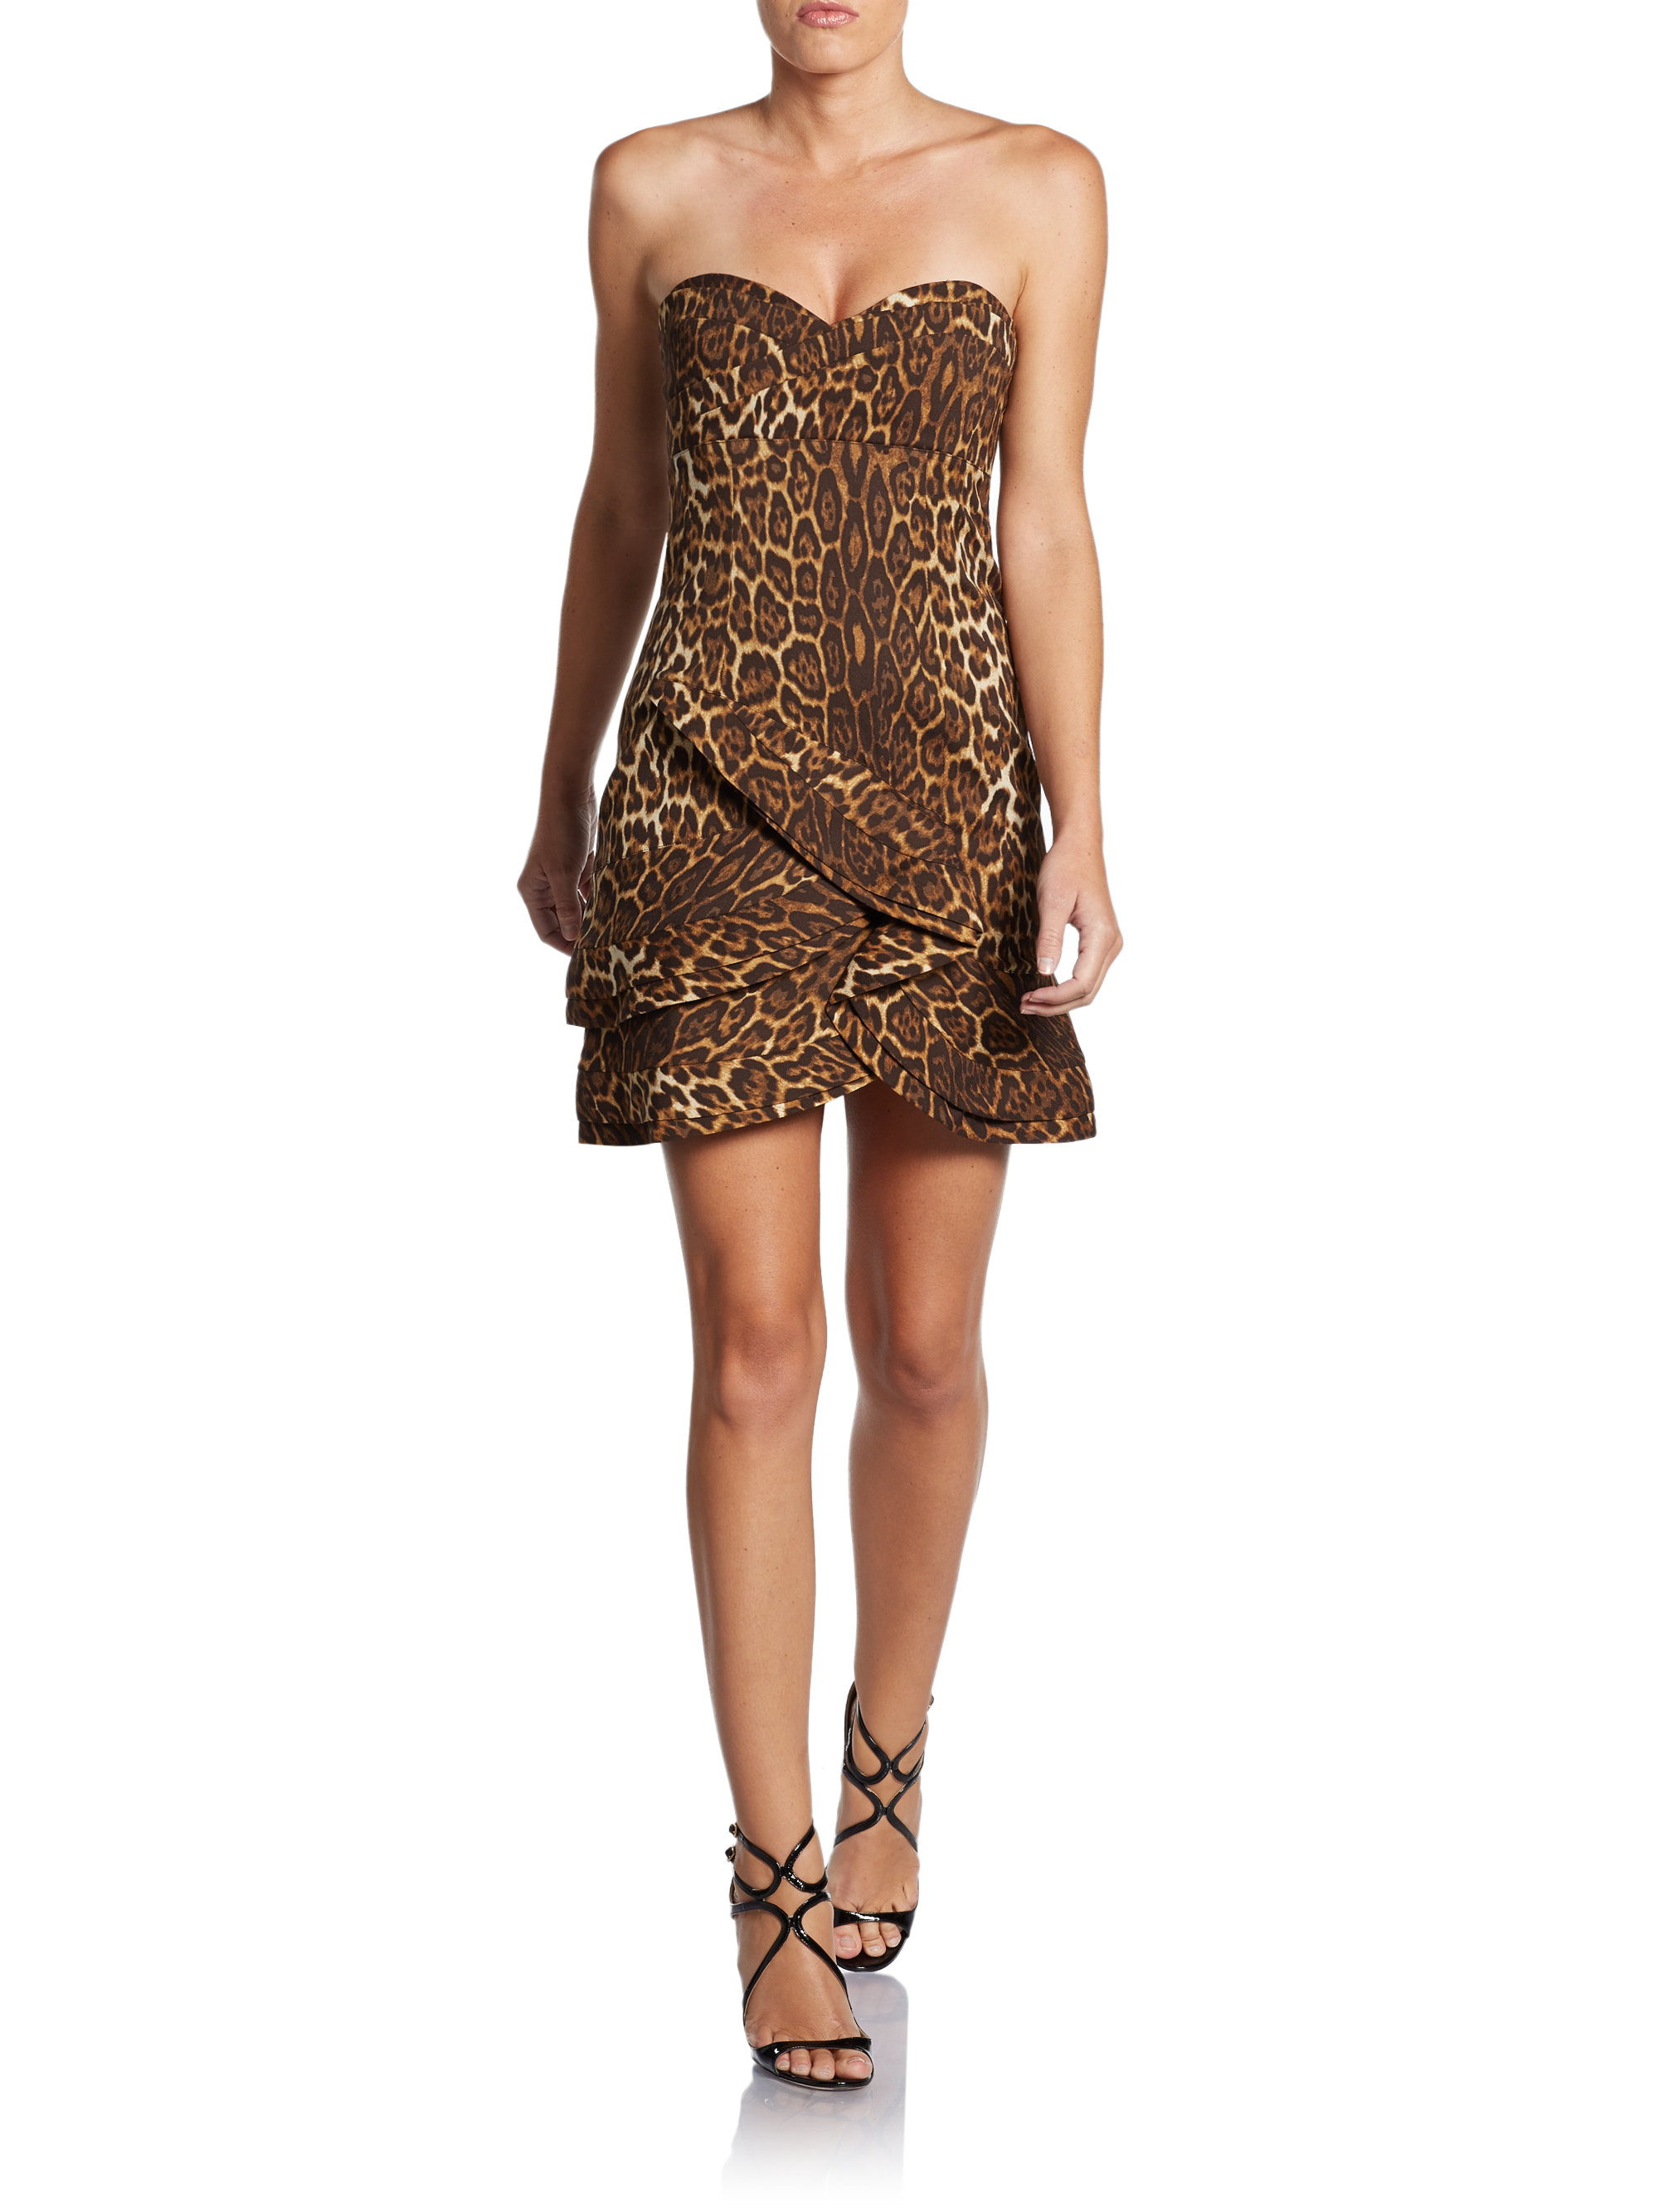 Bcbgmaxazria Dorin Leopard Print Strapless Cocktail Dress